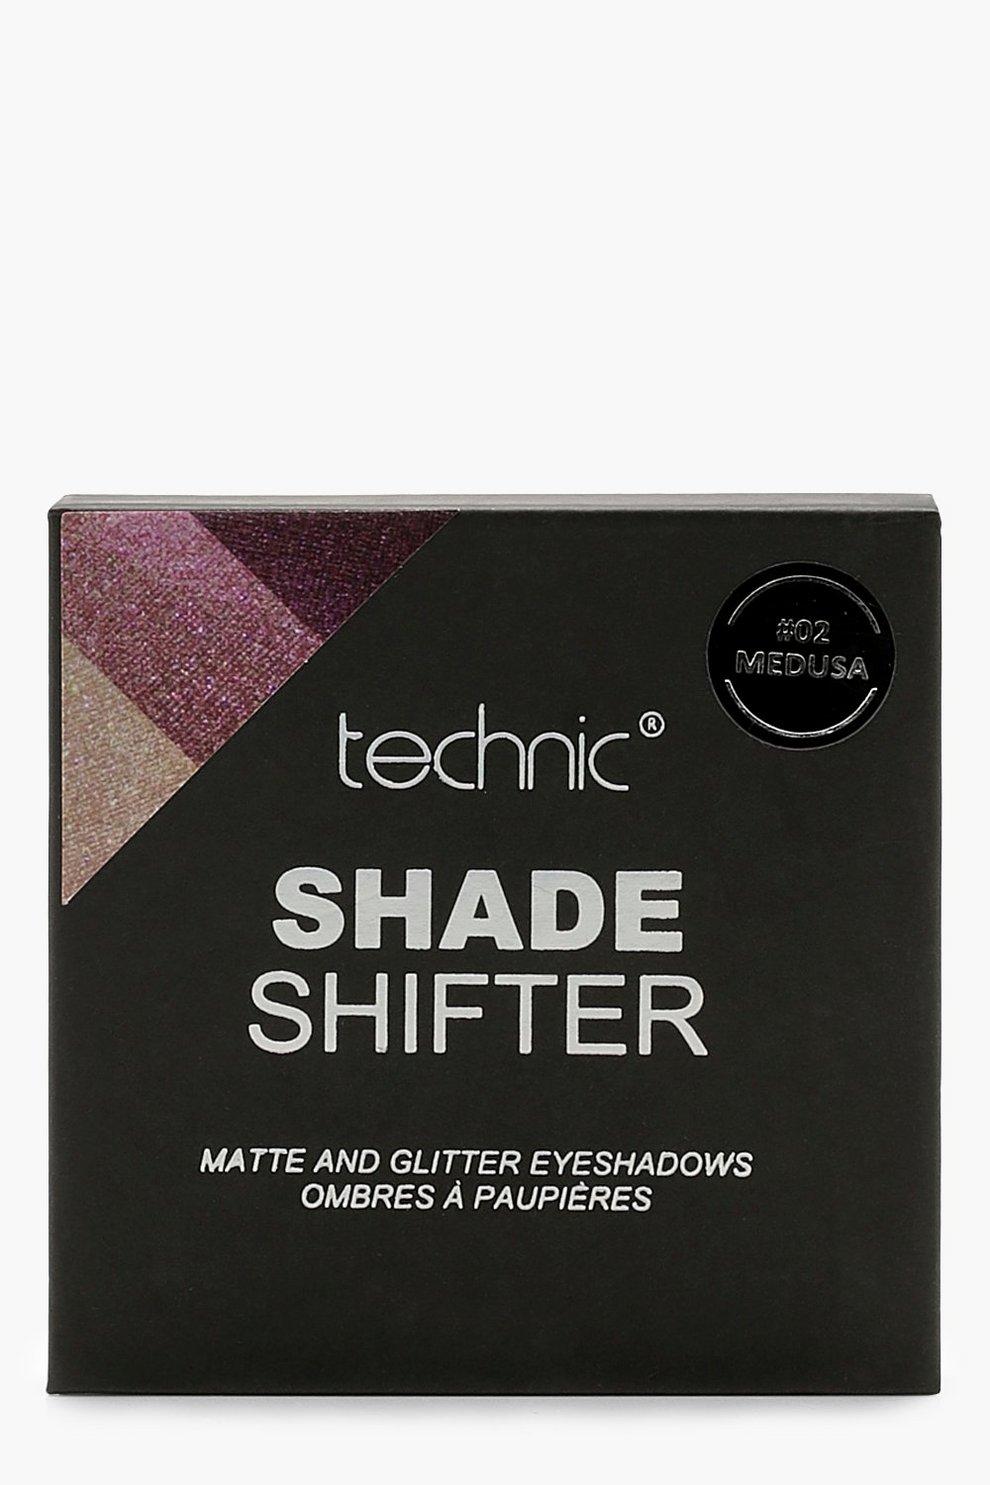 Shade Shifter 02 Medusa Eyeshadow Palette Boohoo